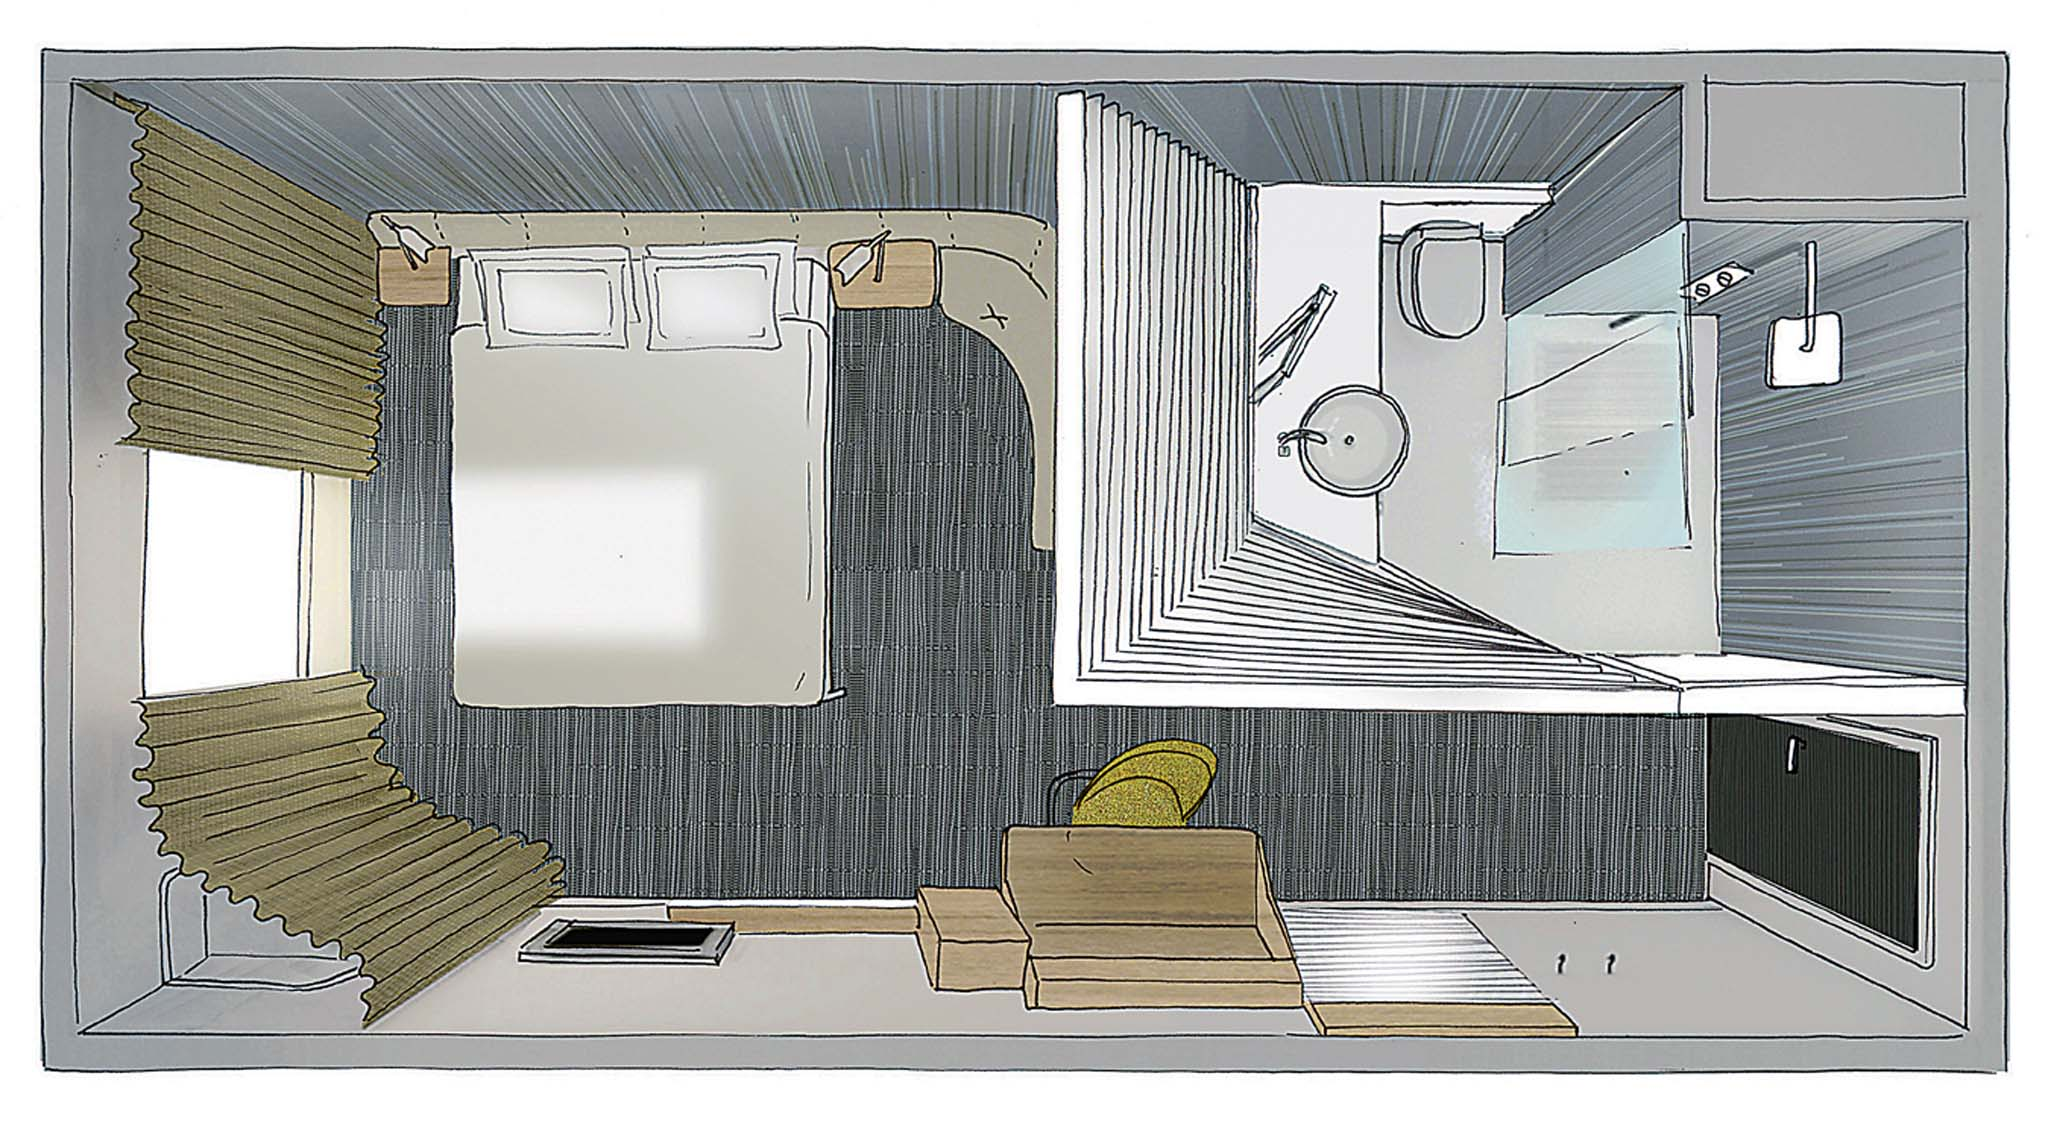 Studio norguet design okko h tel nantes for Hotel design nantes